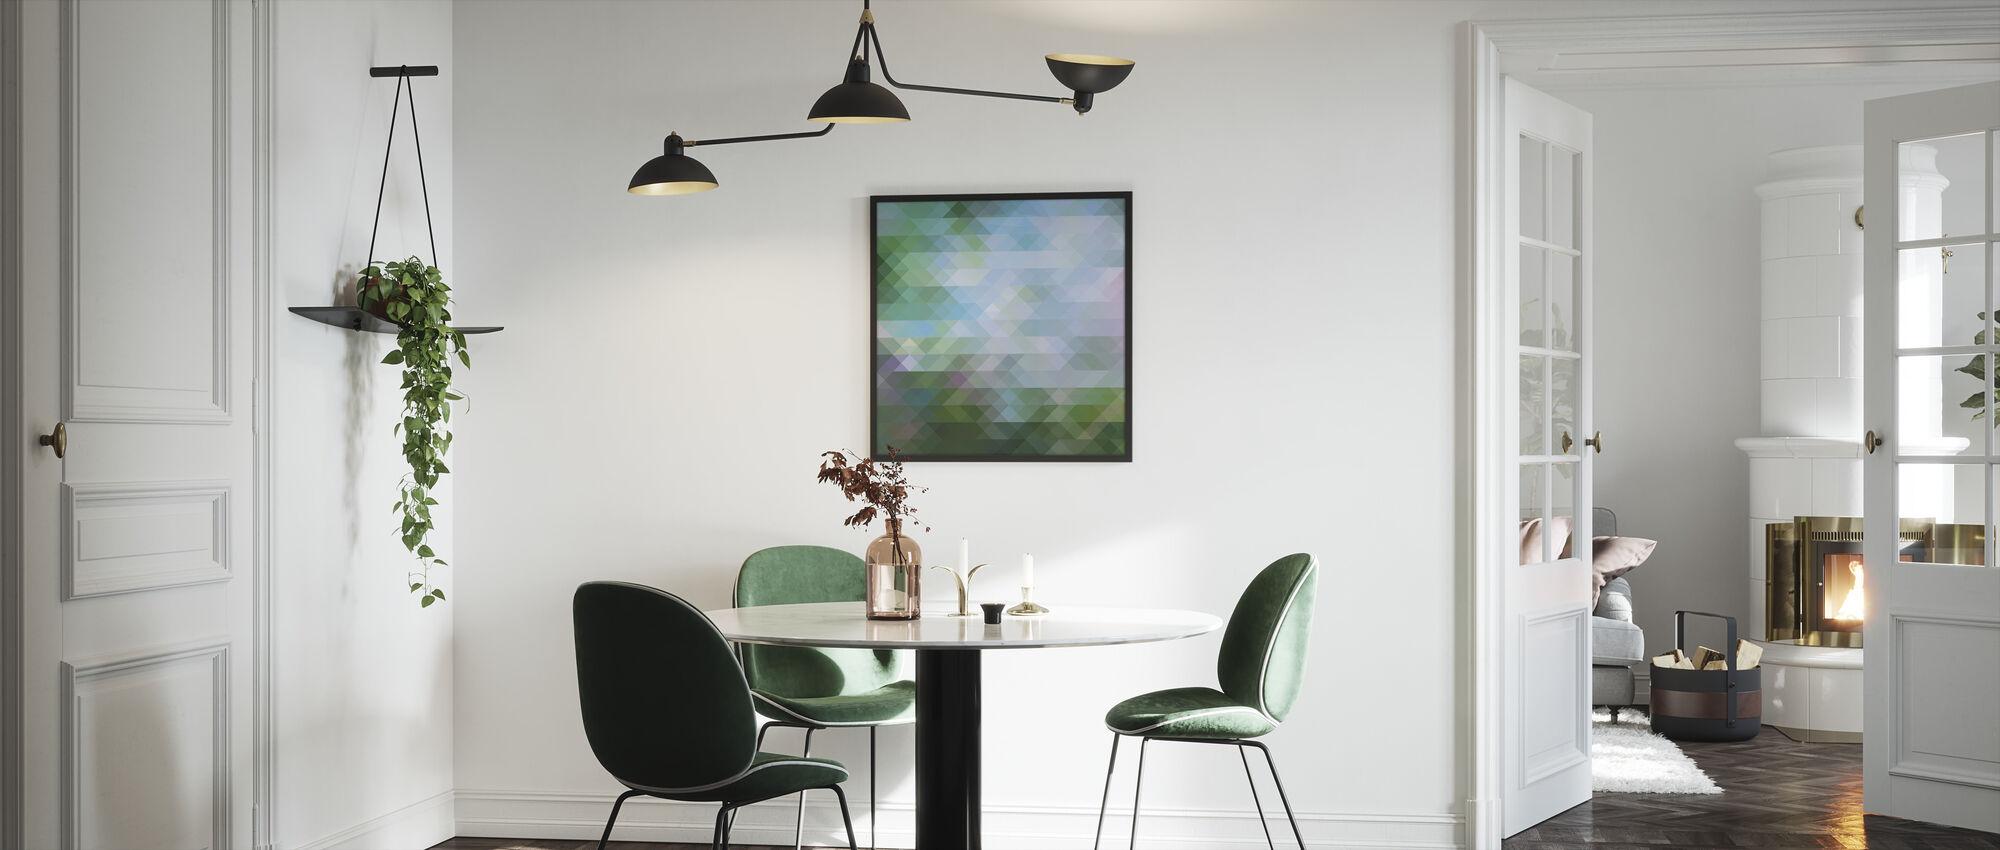 Abstract Triangular Pattern 2 - Framed print - Kitchen